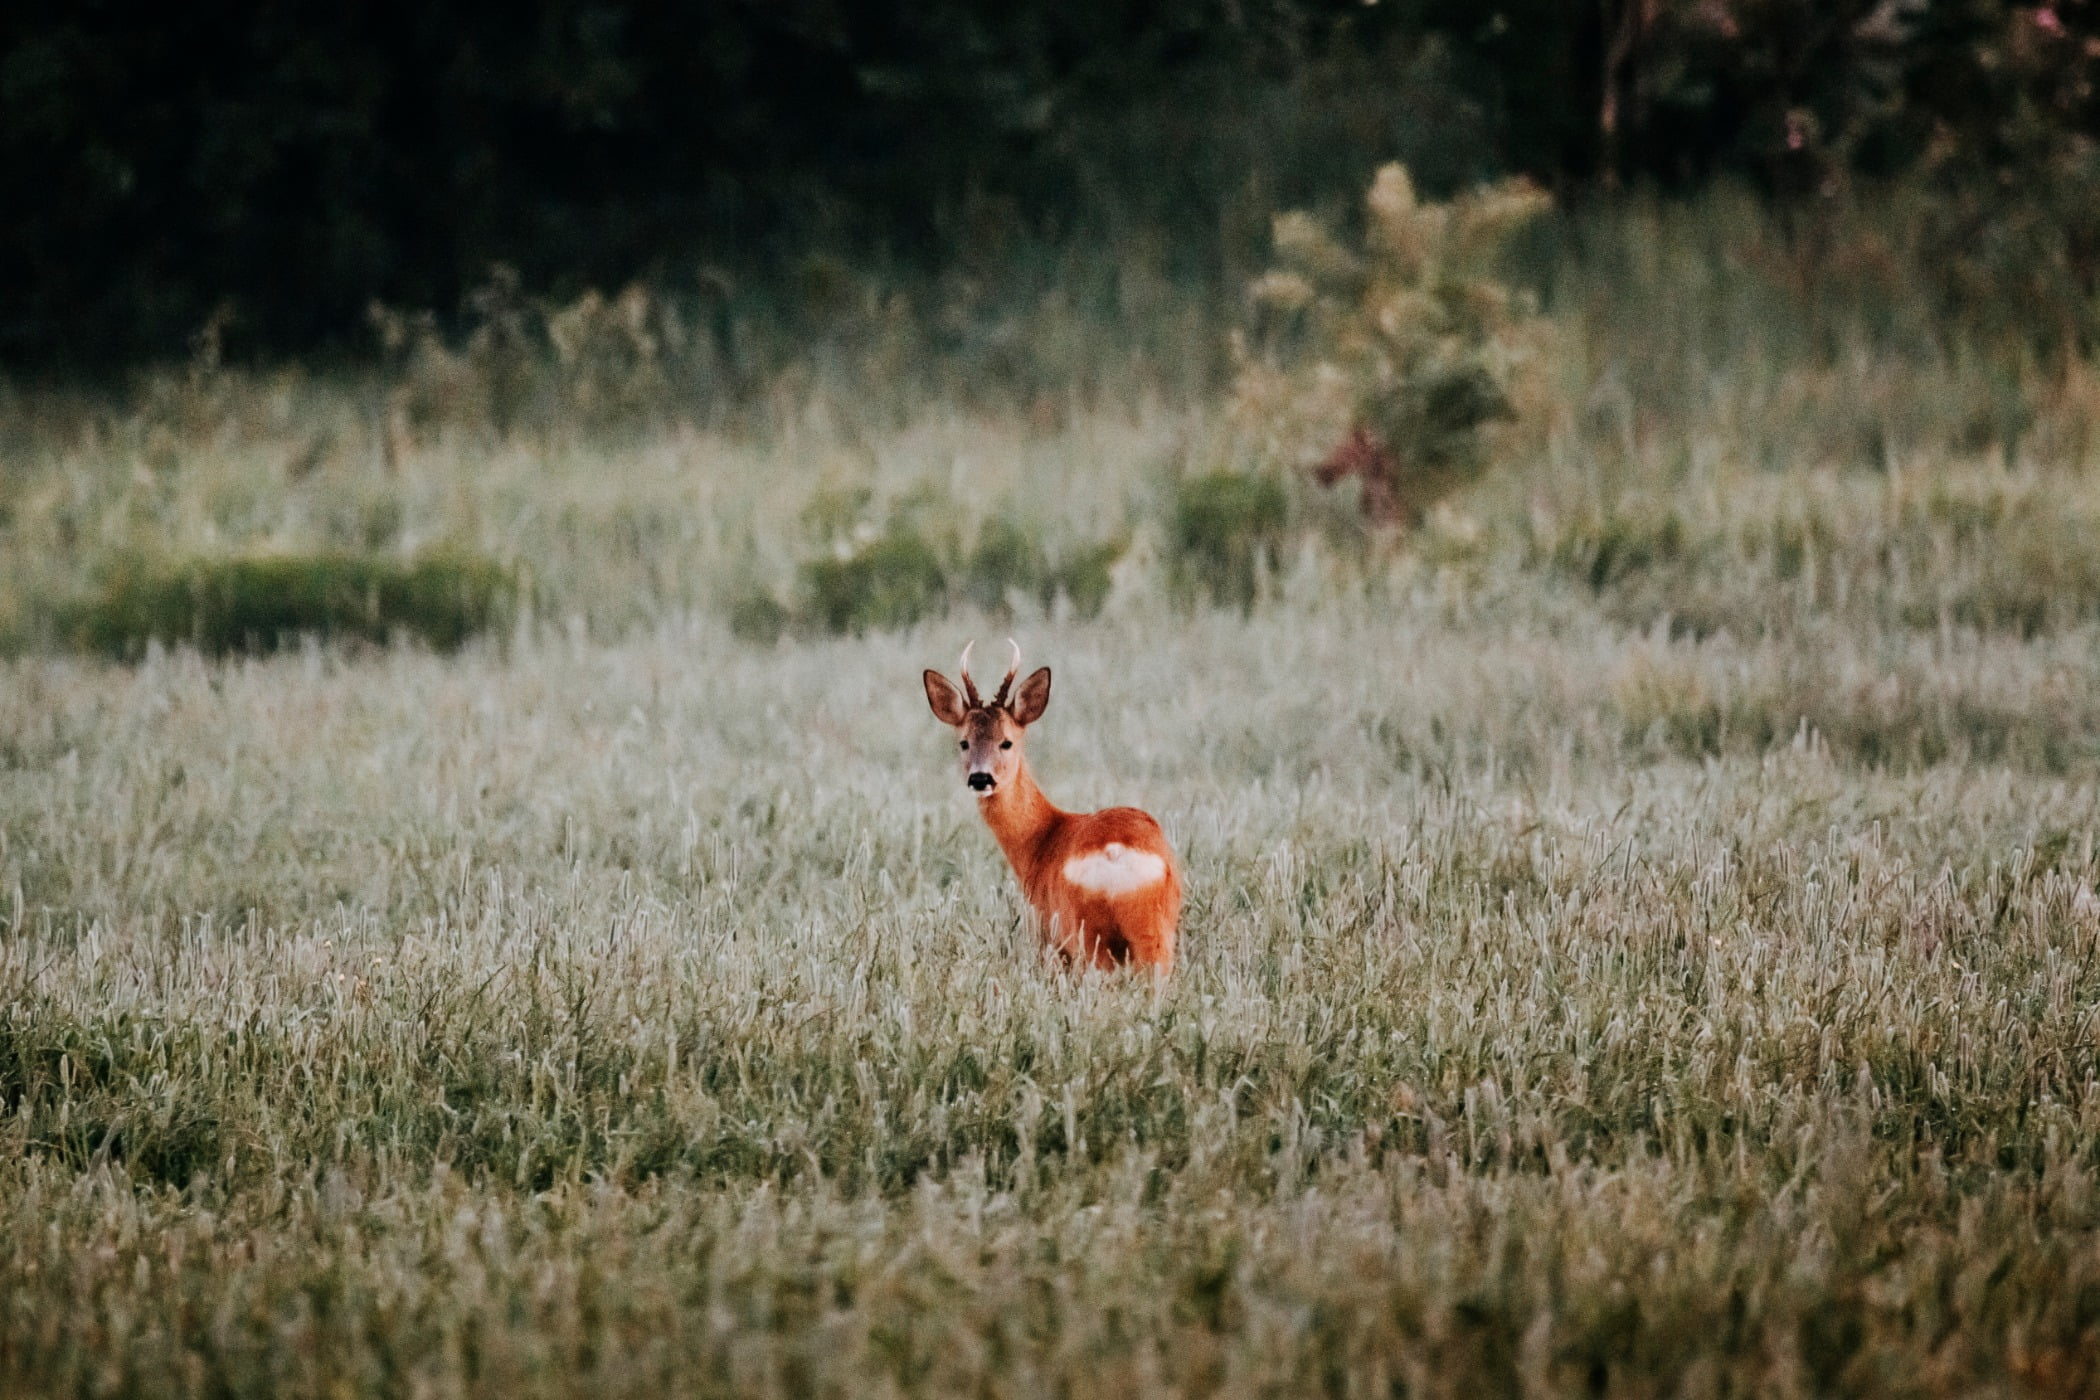 Natural landscape, Terrestrial animal, Plant, Deer, Fawn, Grass, Grassland